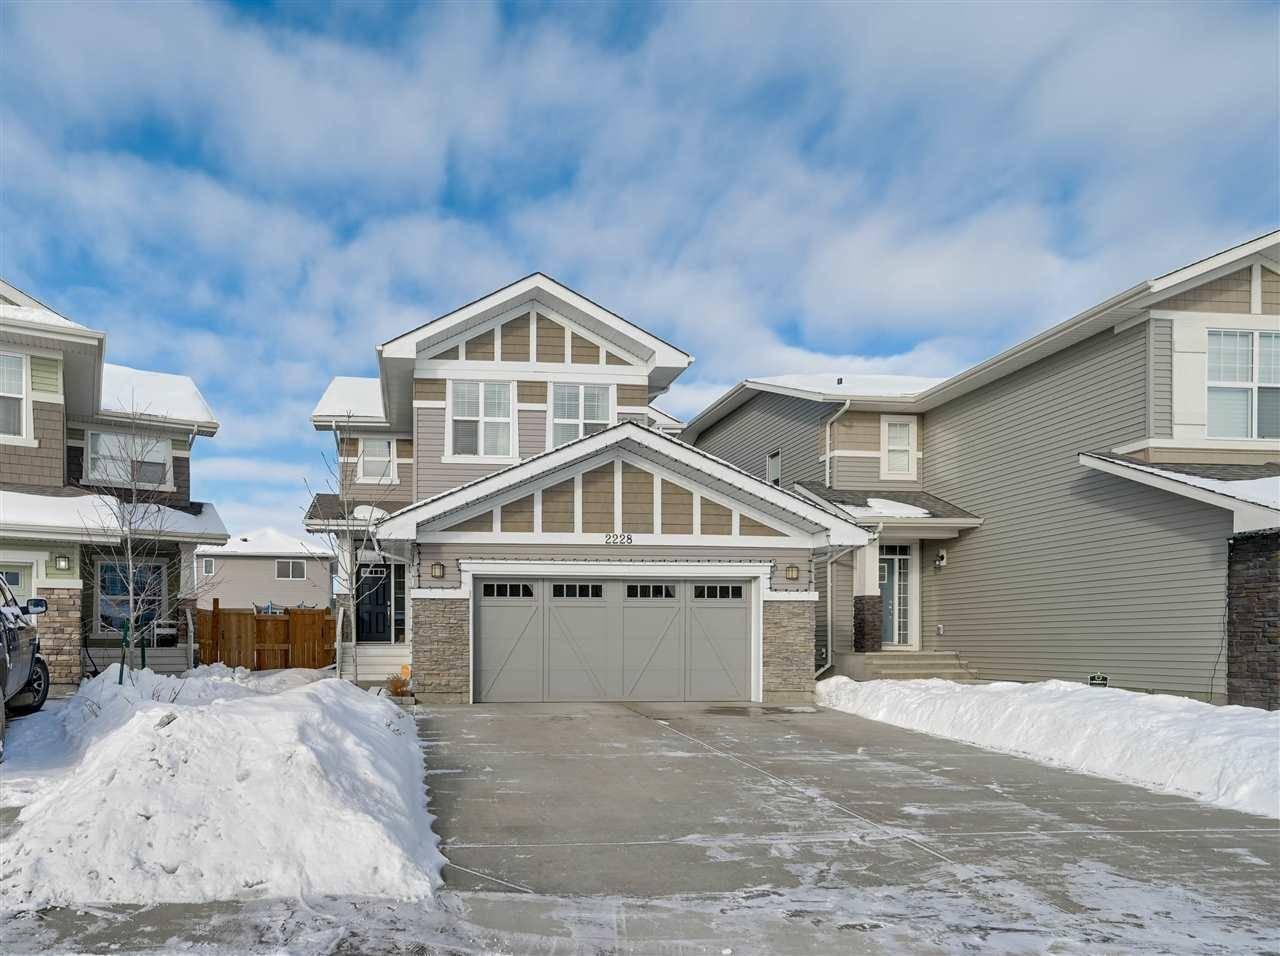 House for sale at 2228 Calhoun Li Sw Edmonton Alberta - MLS: E4186269